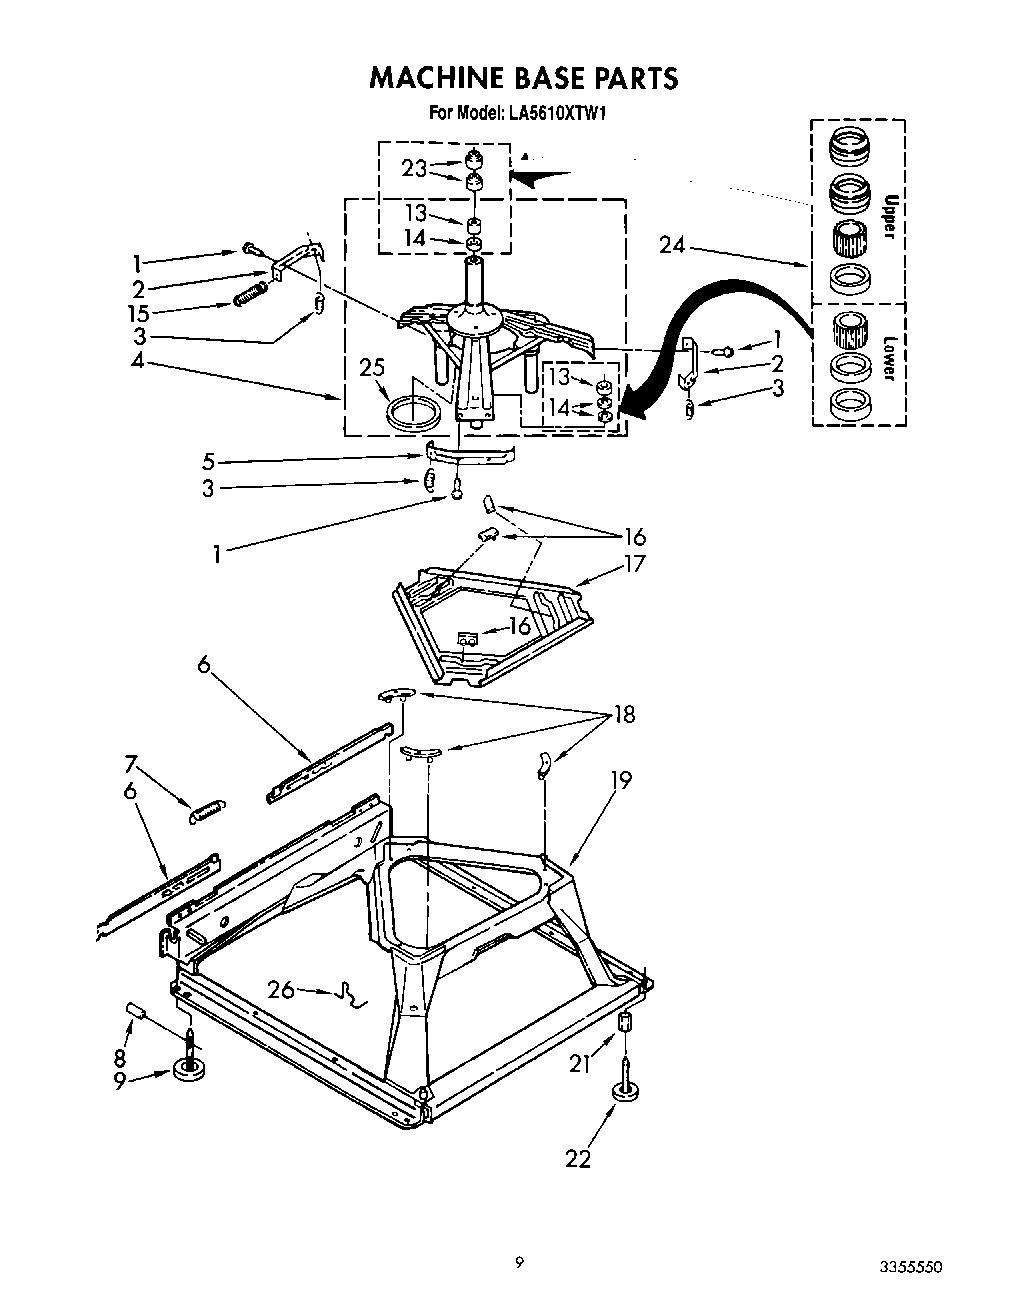 LA5610XTN1